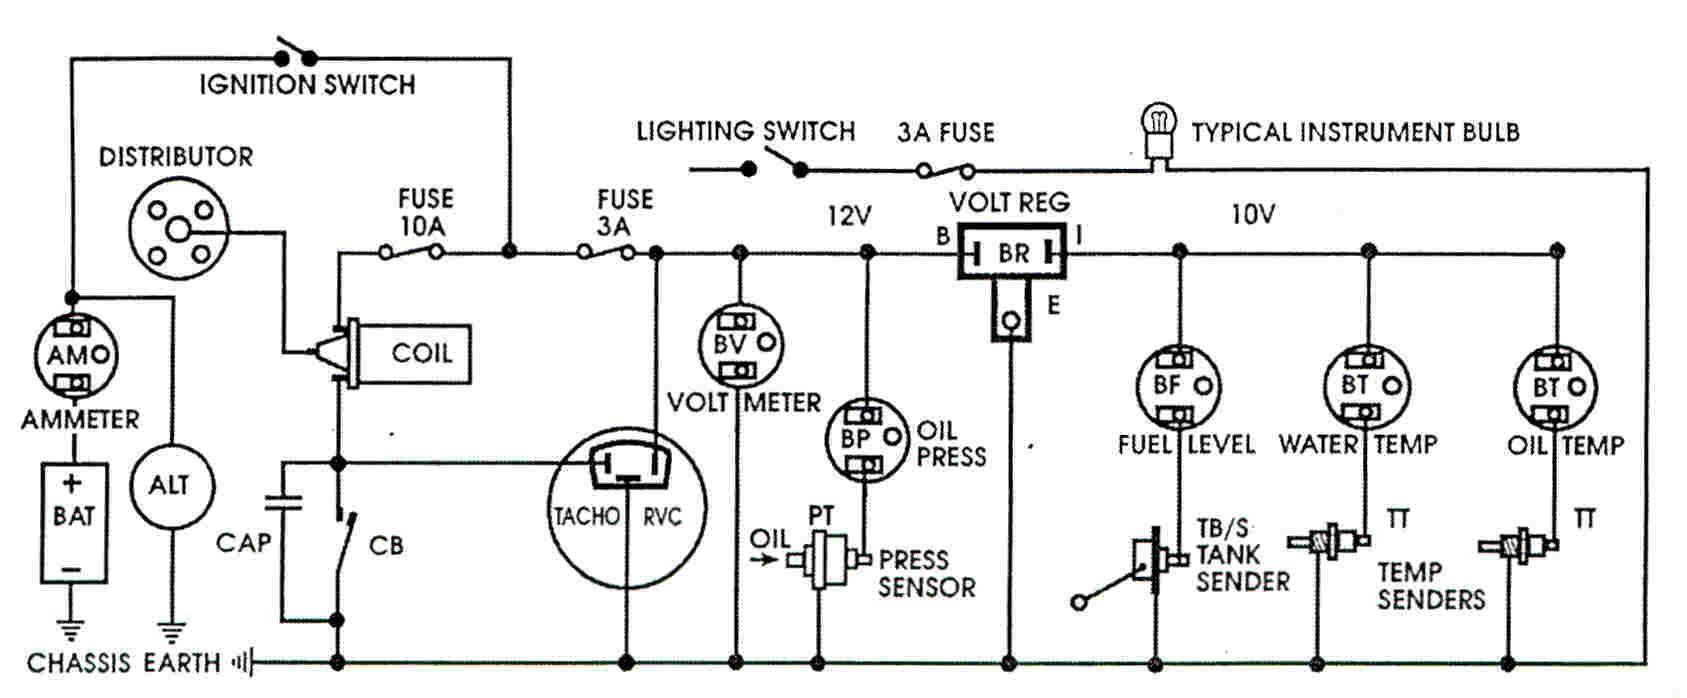 hight resolution of thrifty voltage regulator circuit diagram wiring diagram week thrifty voltage regulator circuit diagram